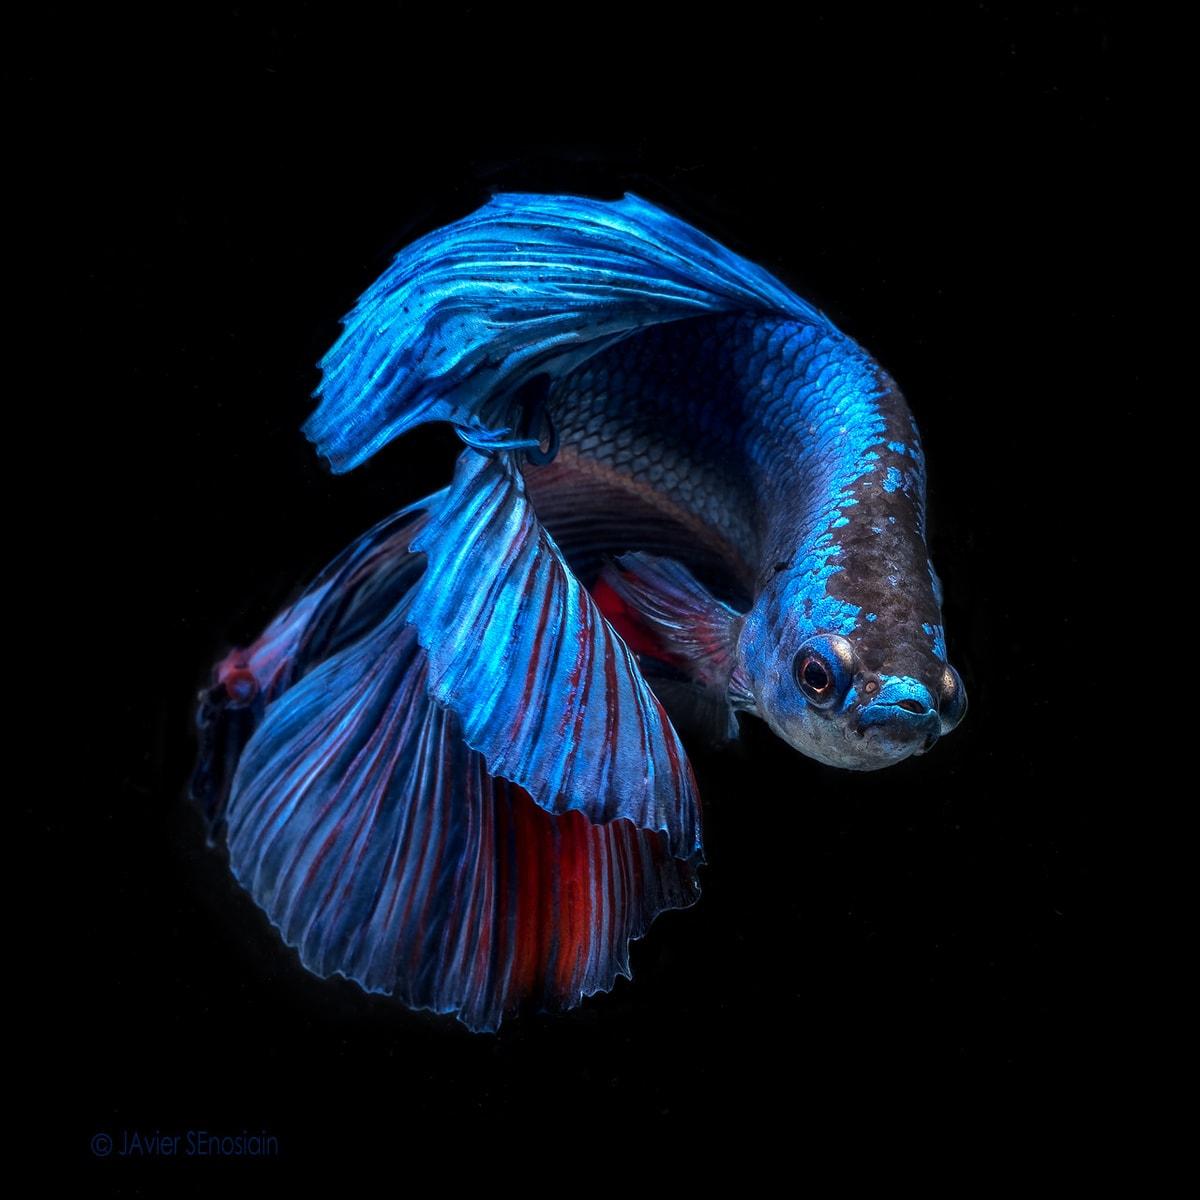 """Azul eléctrico"" por Javier Senosiain. X-T2 + XF 60mm F2.4."